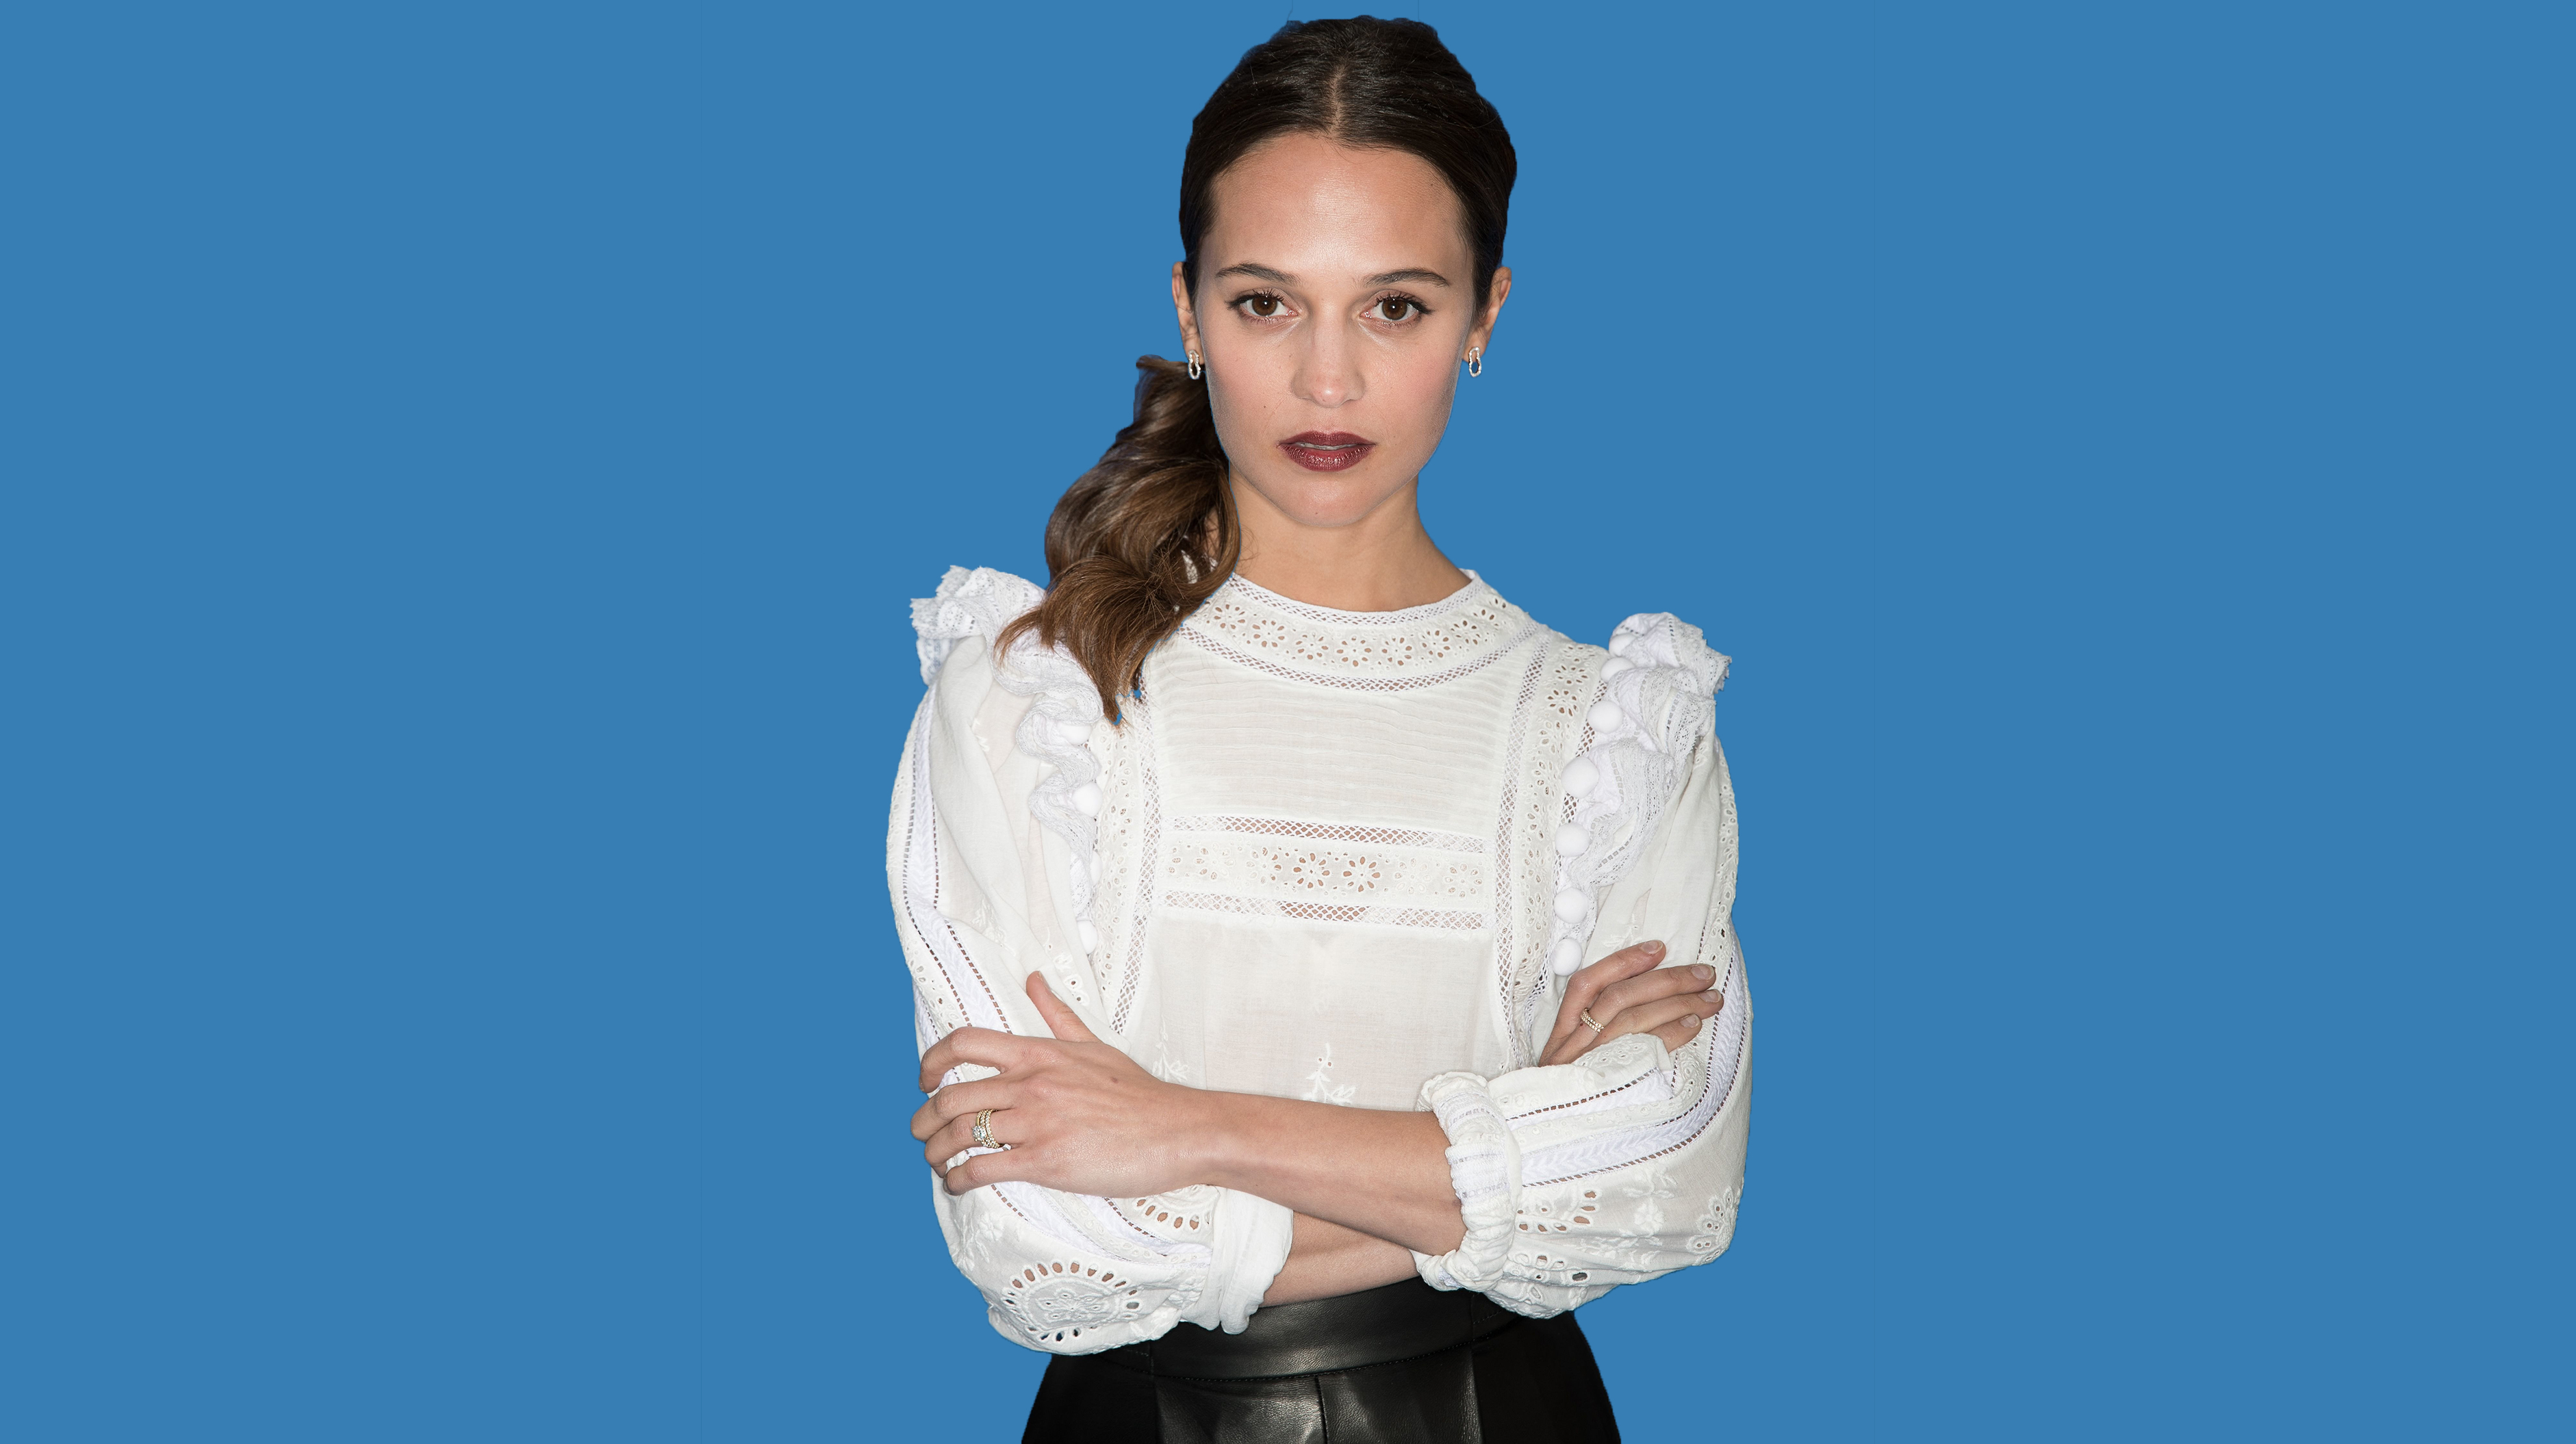 2019 Alicia Vikander Wallpaper HD Celebrities 4K Wallpapers 3763x2110